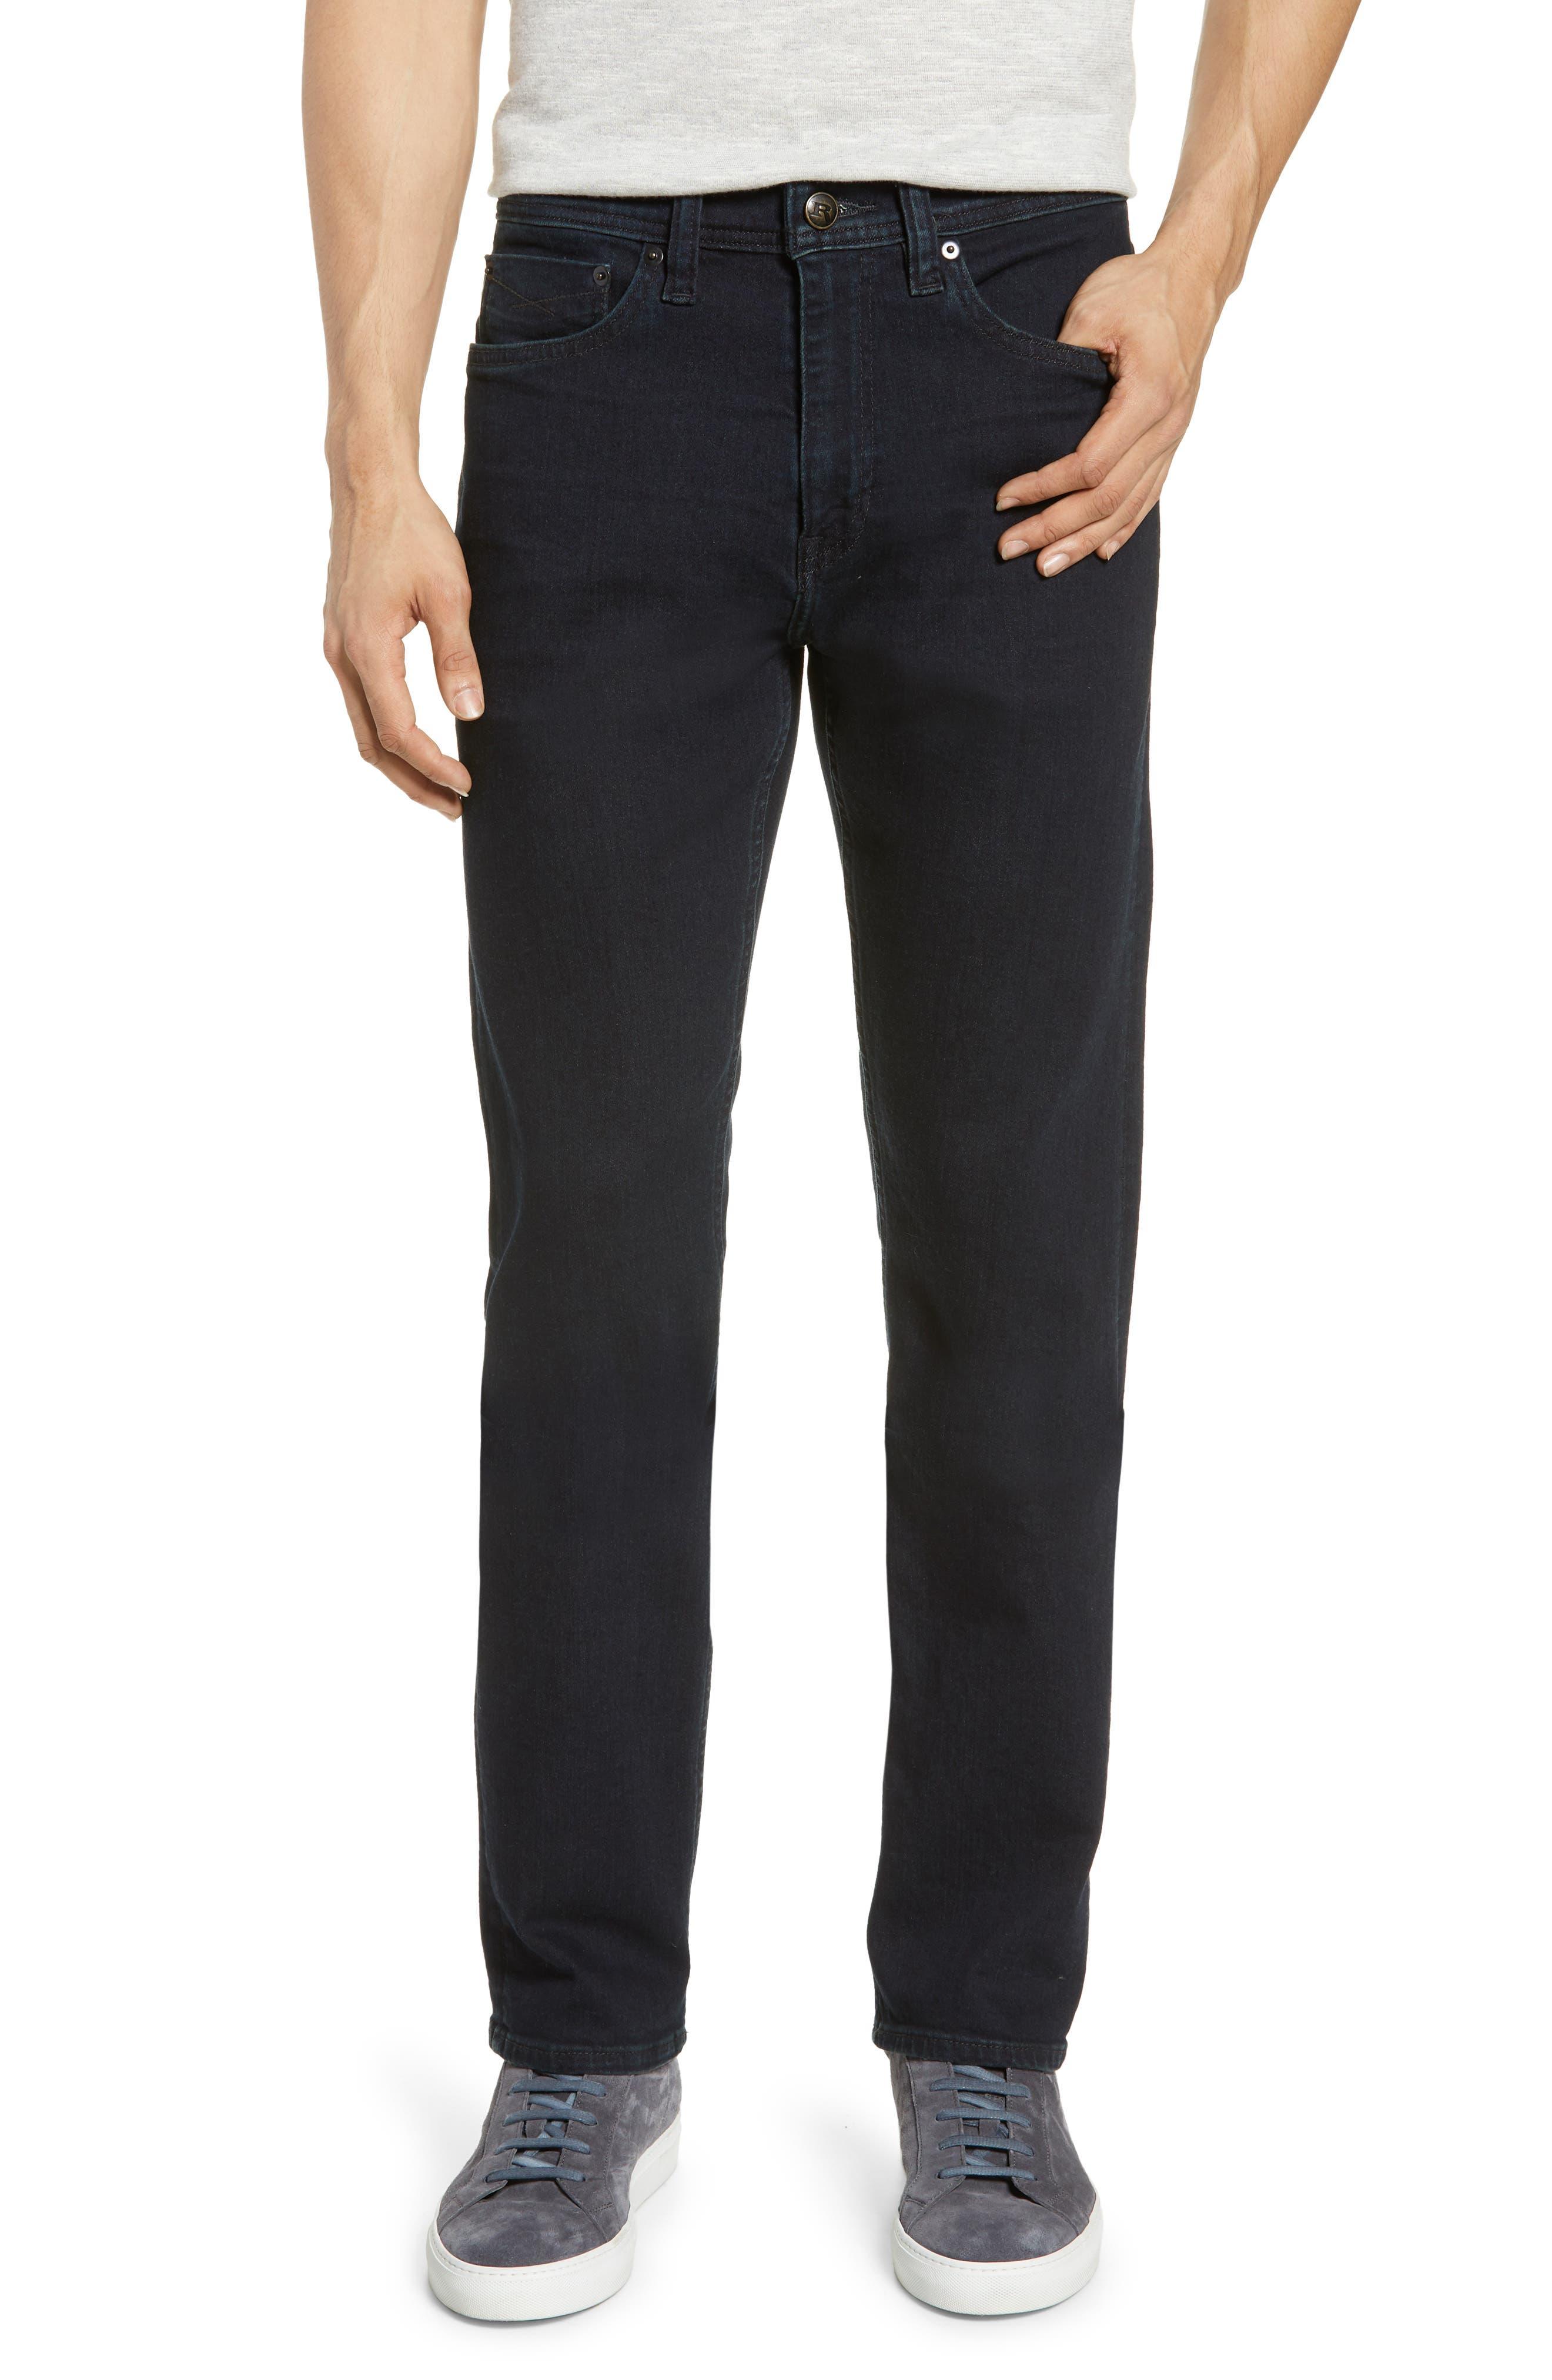 REVTOWN Sharp Slim Fit Jeans, Main, color, RINSE INDIGO